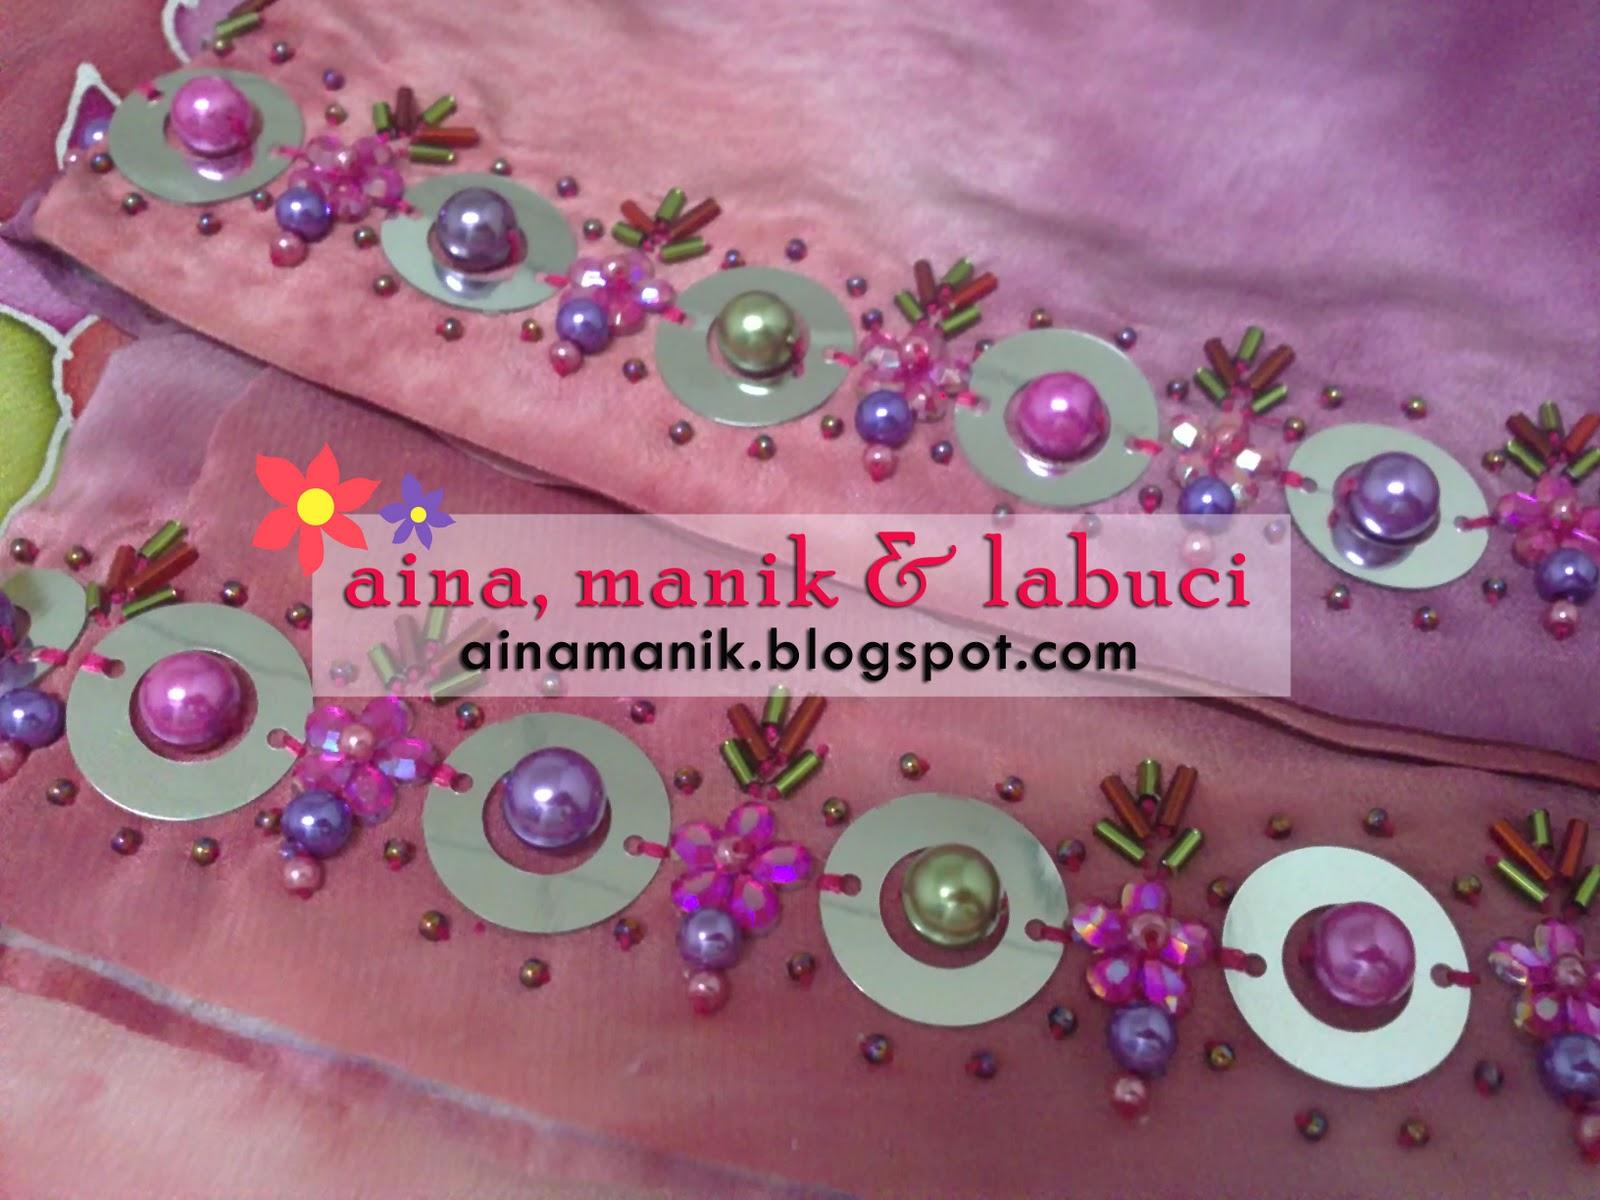 August Aina Creative Design Labels Manik Juntai Manik Tabur